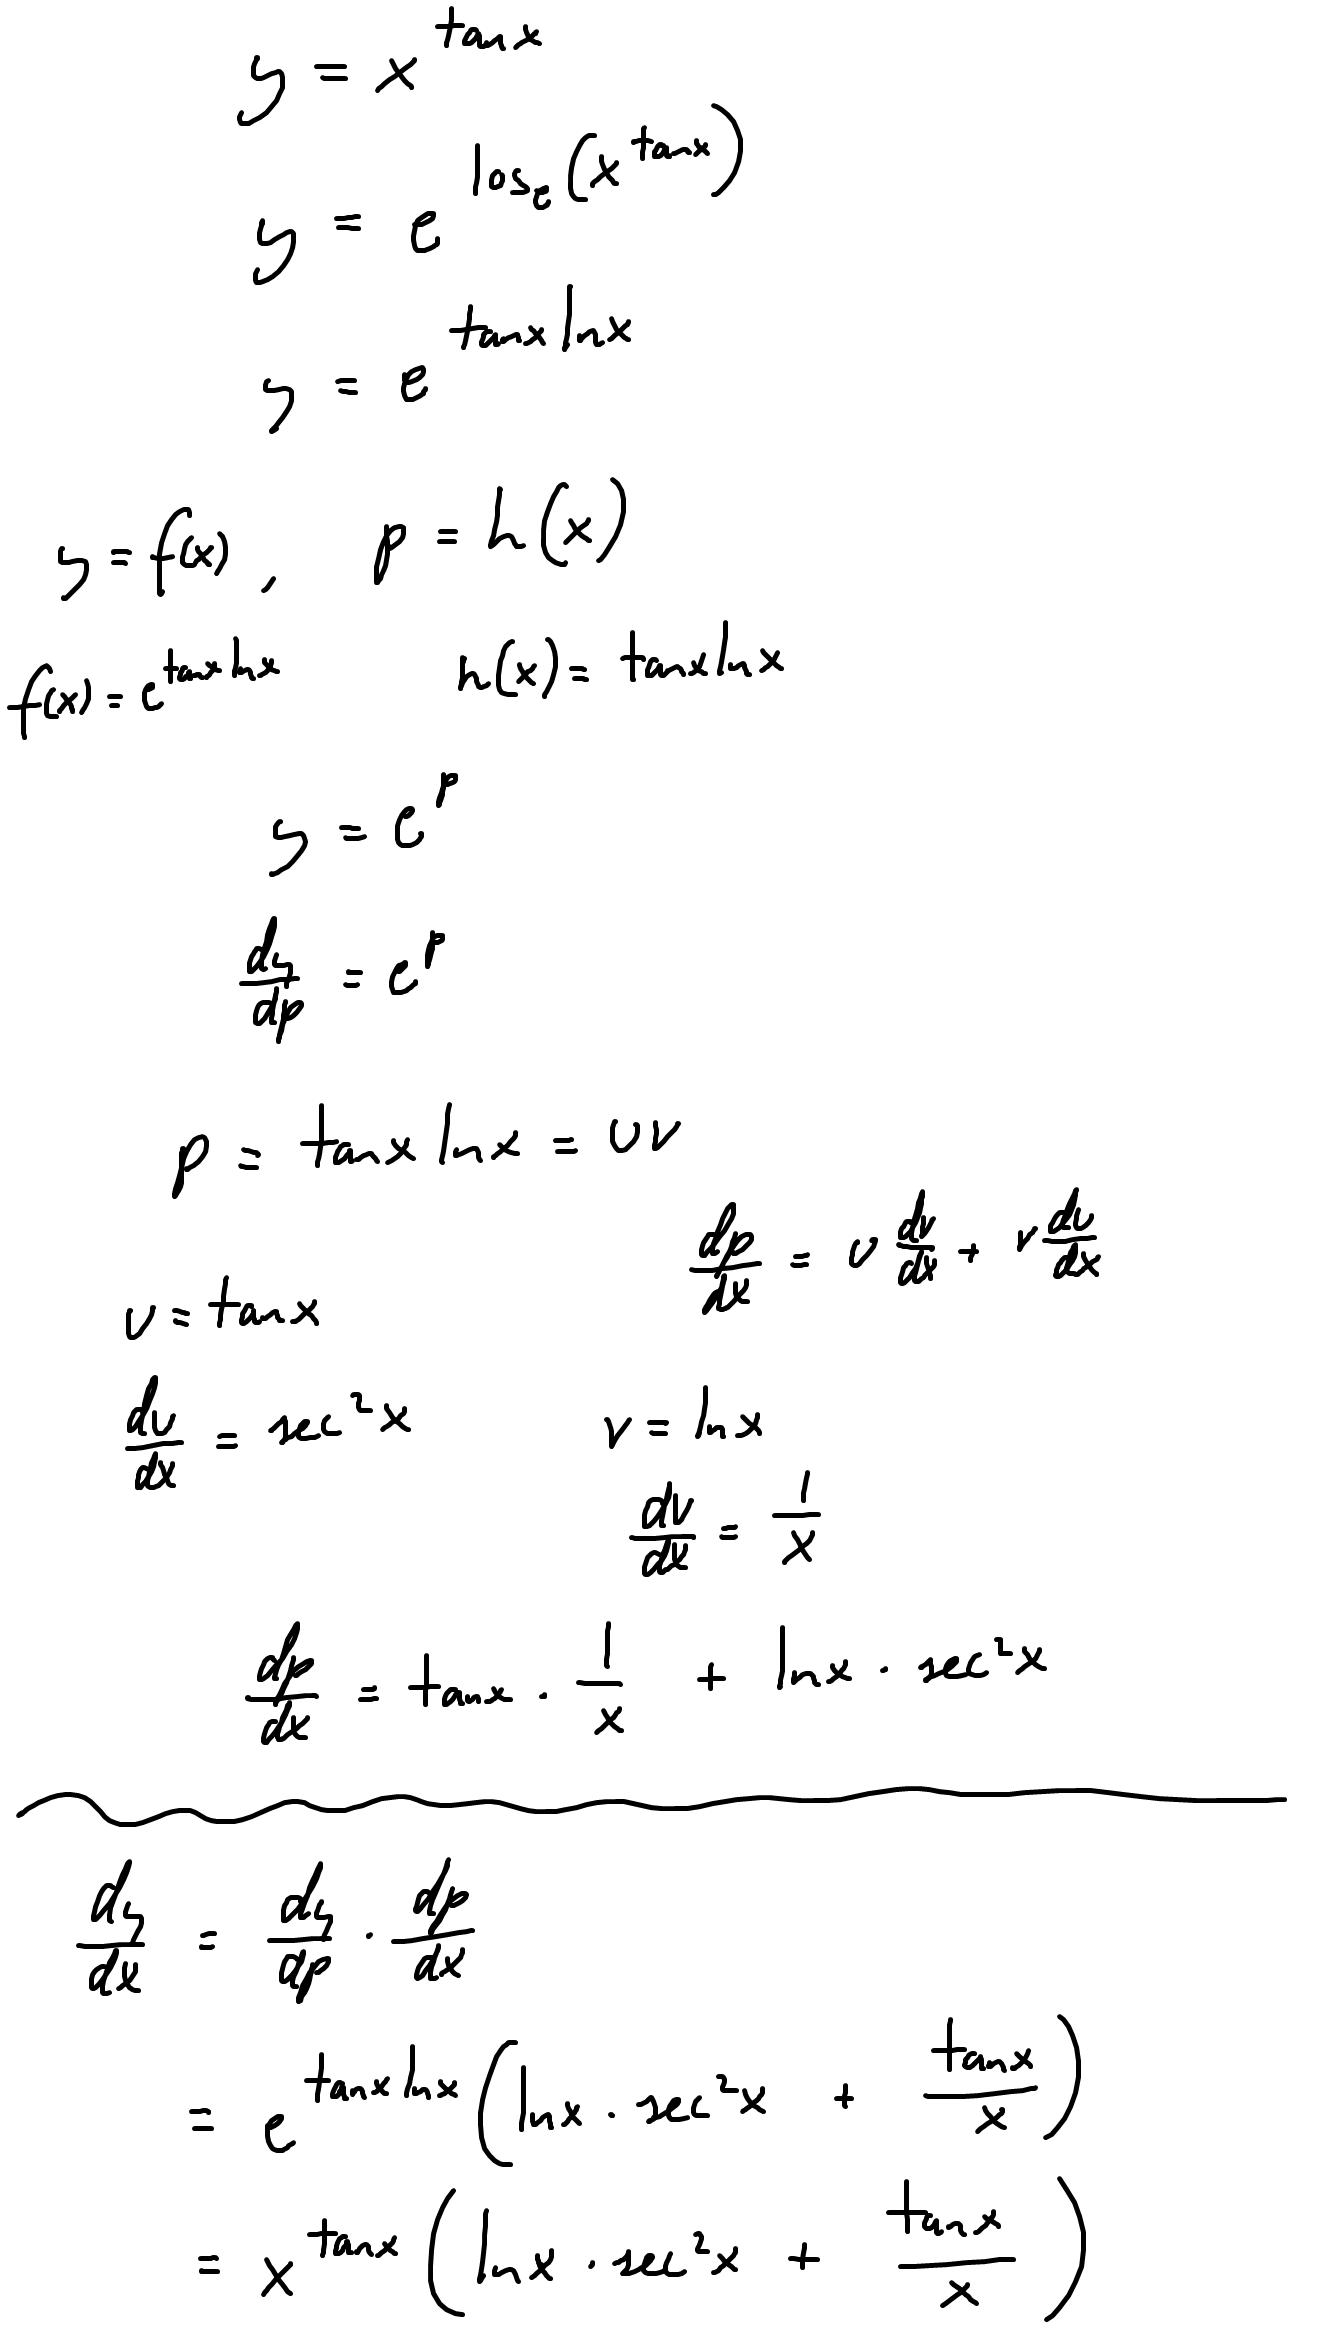 Derivative of x^(tanx)